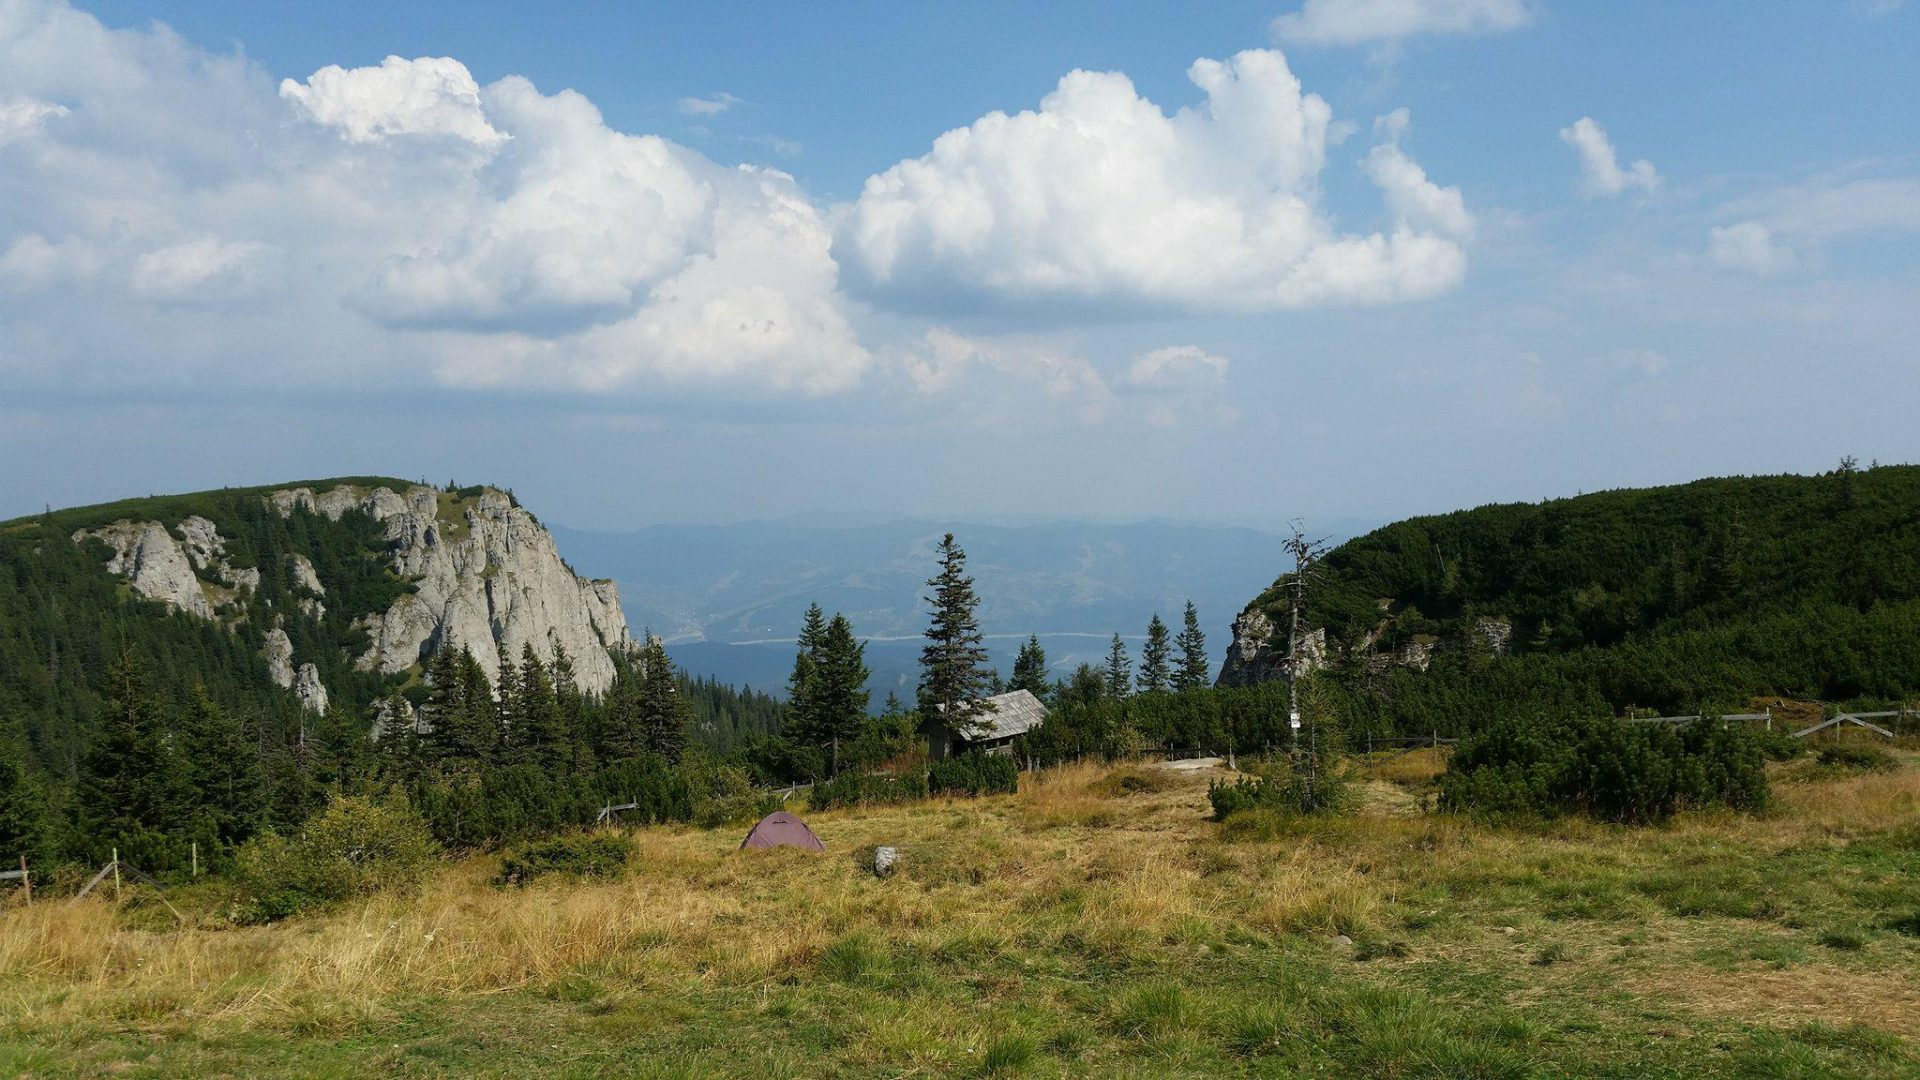 trasee montane din Carpatii Orientali